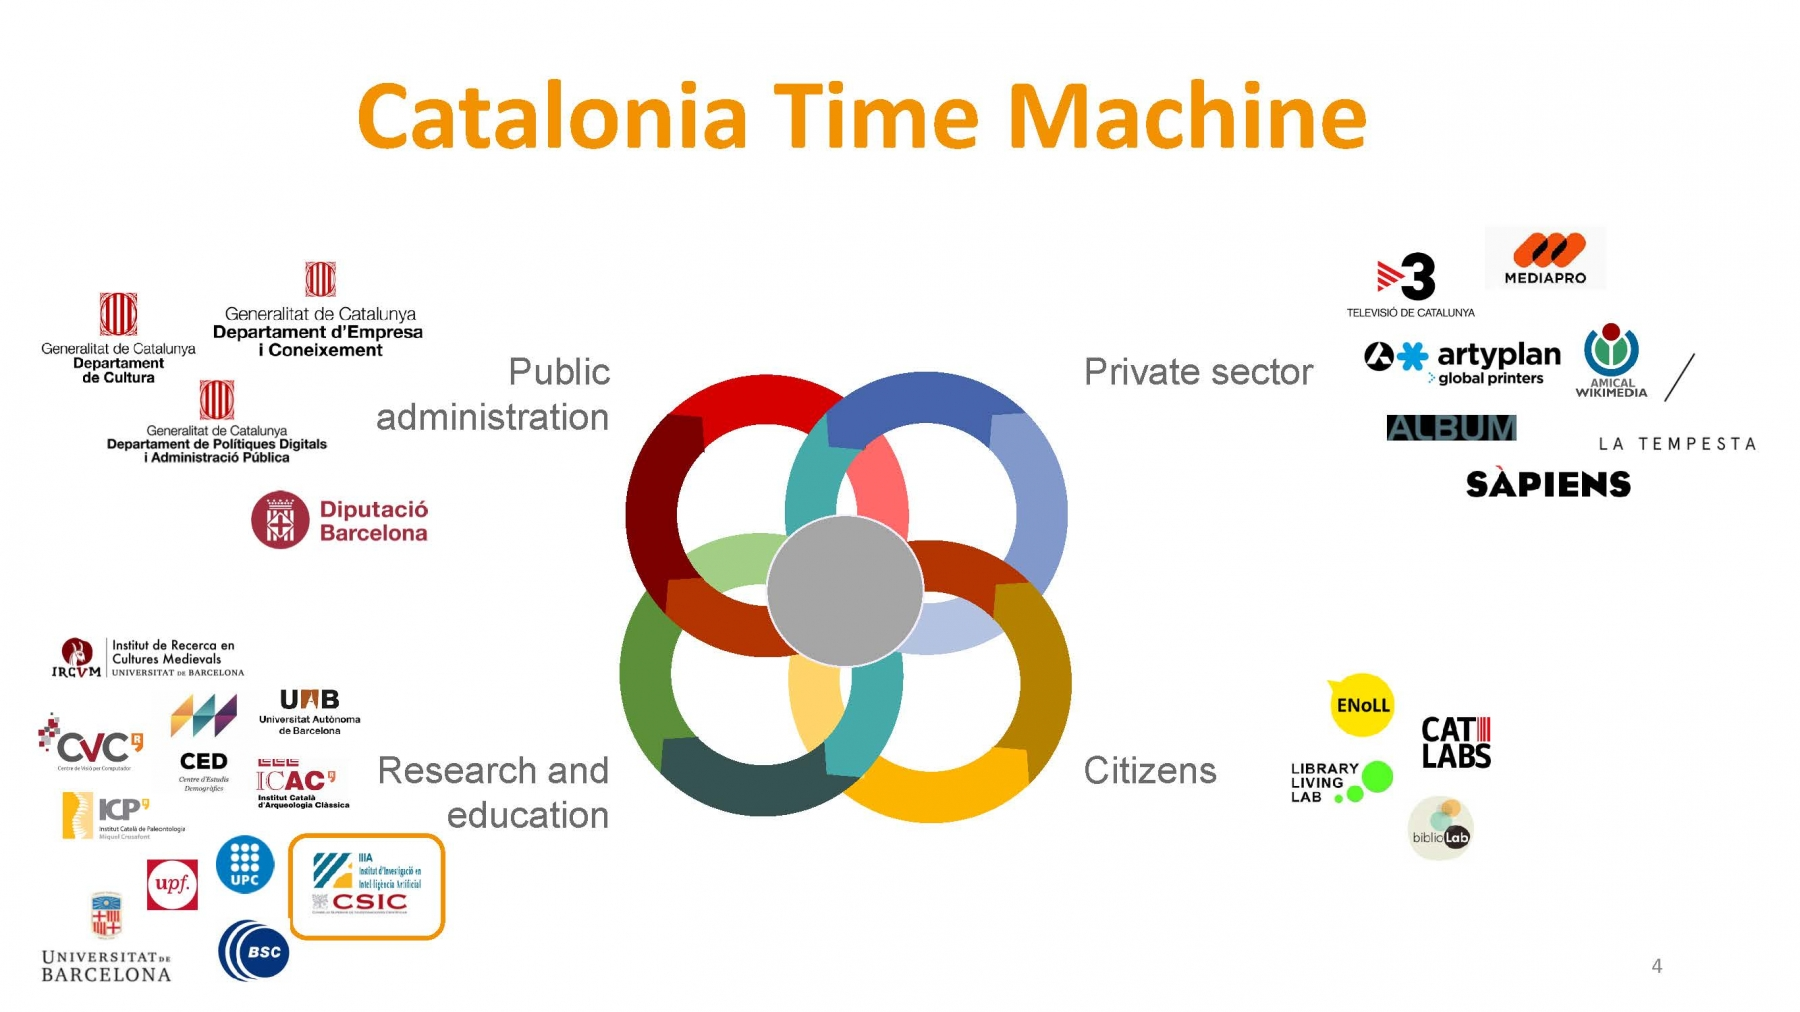 IIIA-CSIC & Catalonia Time Machine (pres. by Jordi Sabater-Mir)